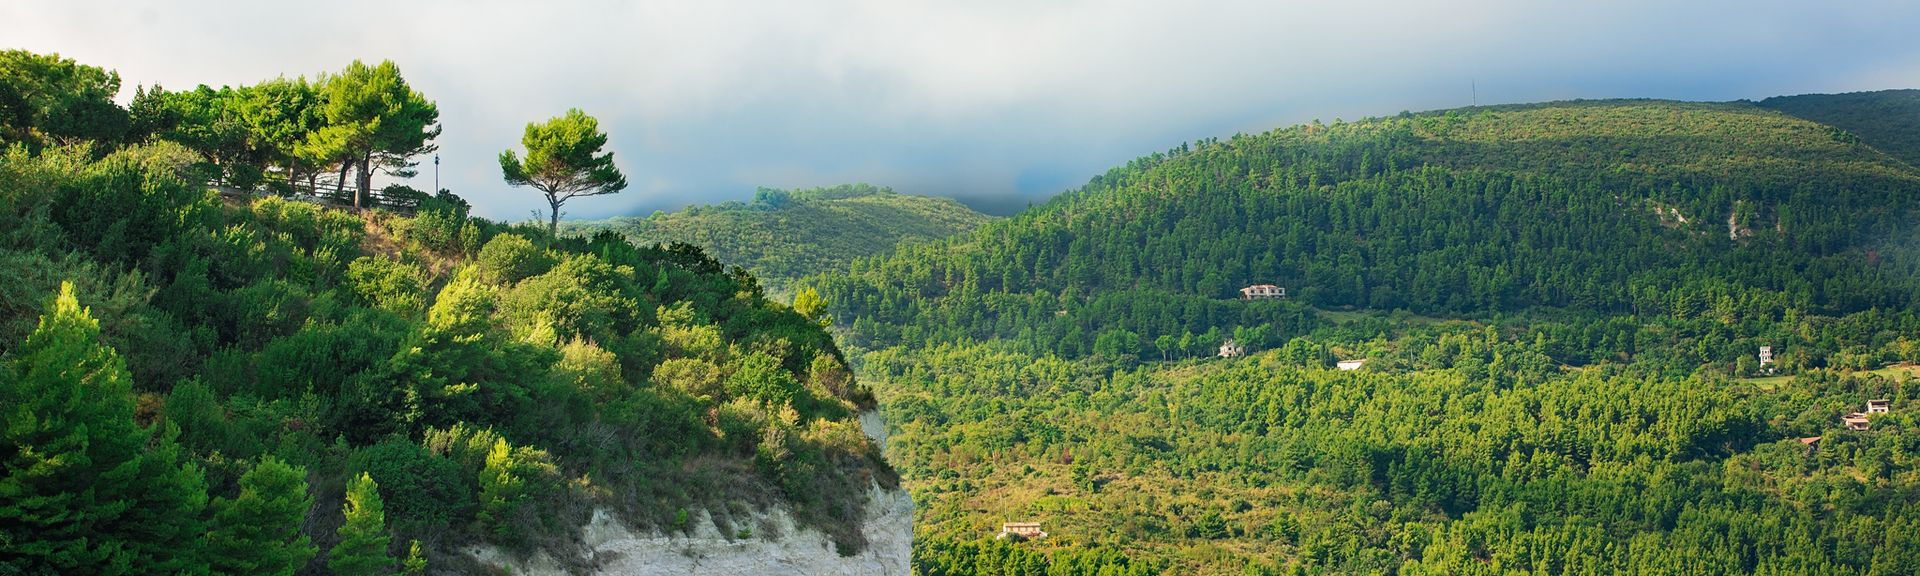 Camerata Picena, Marche, Włochy